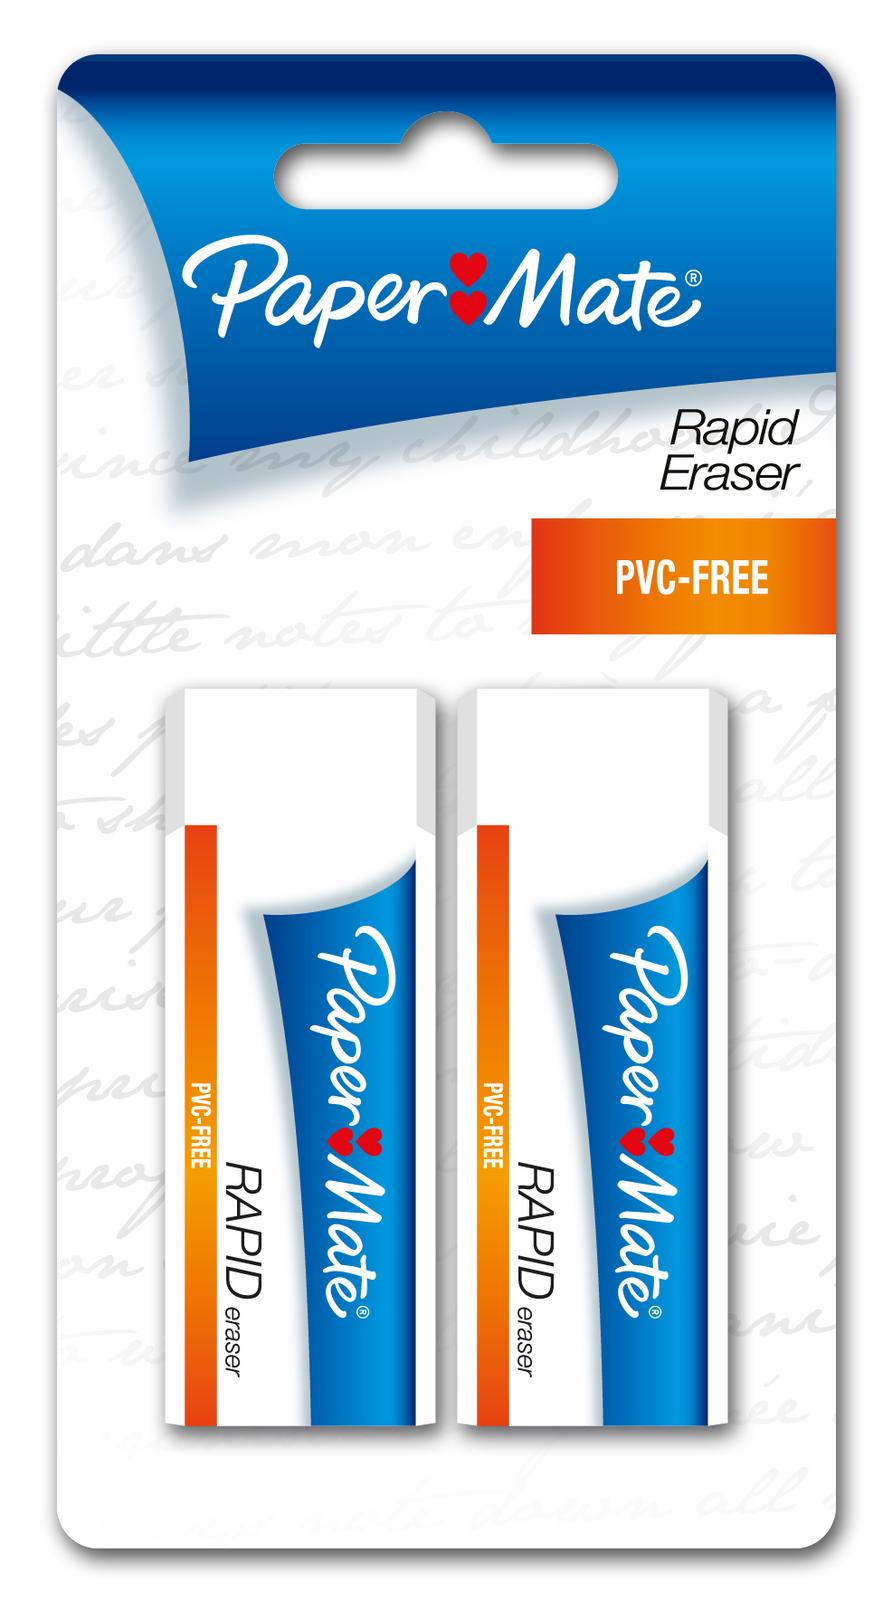 Papermate Rapid Eraser Pkt2 image